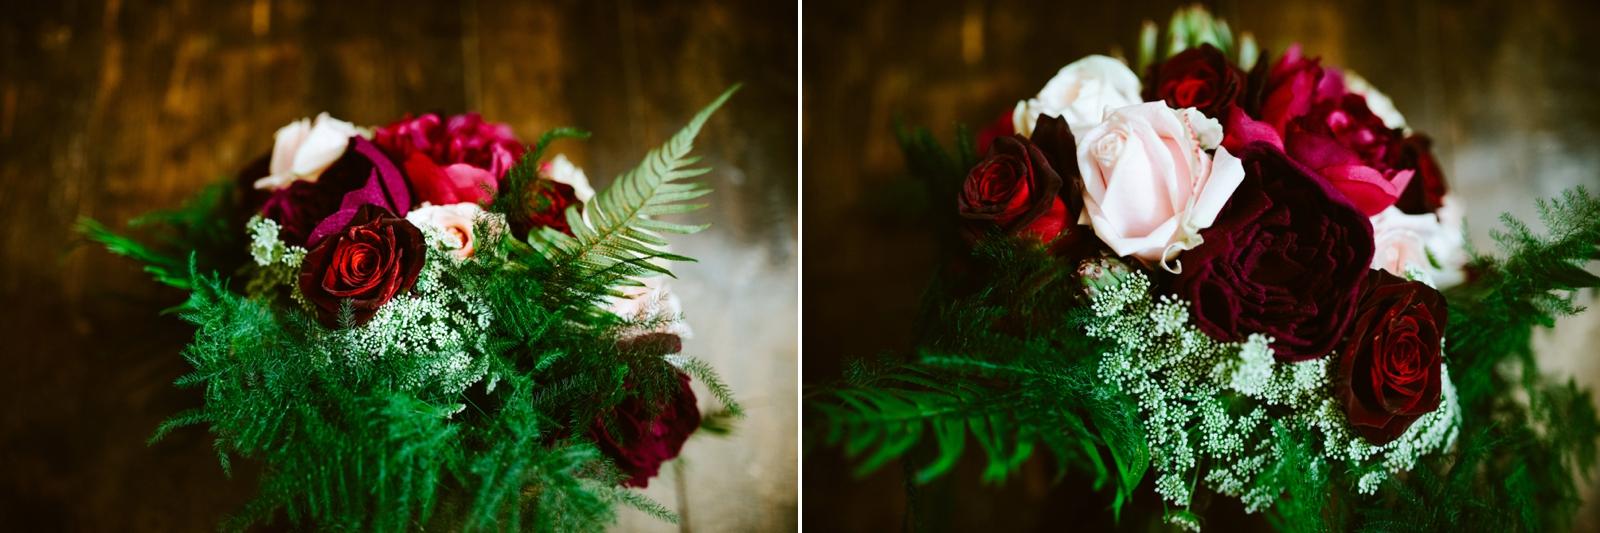 alternative-wedding-photography-scotland-katie-stephen-aikwood-tower-94.jpg